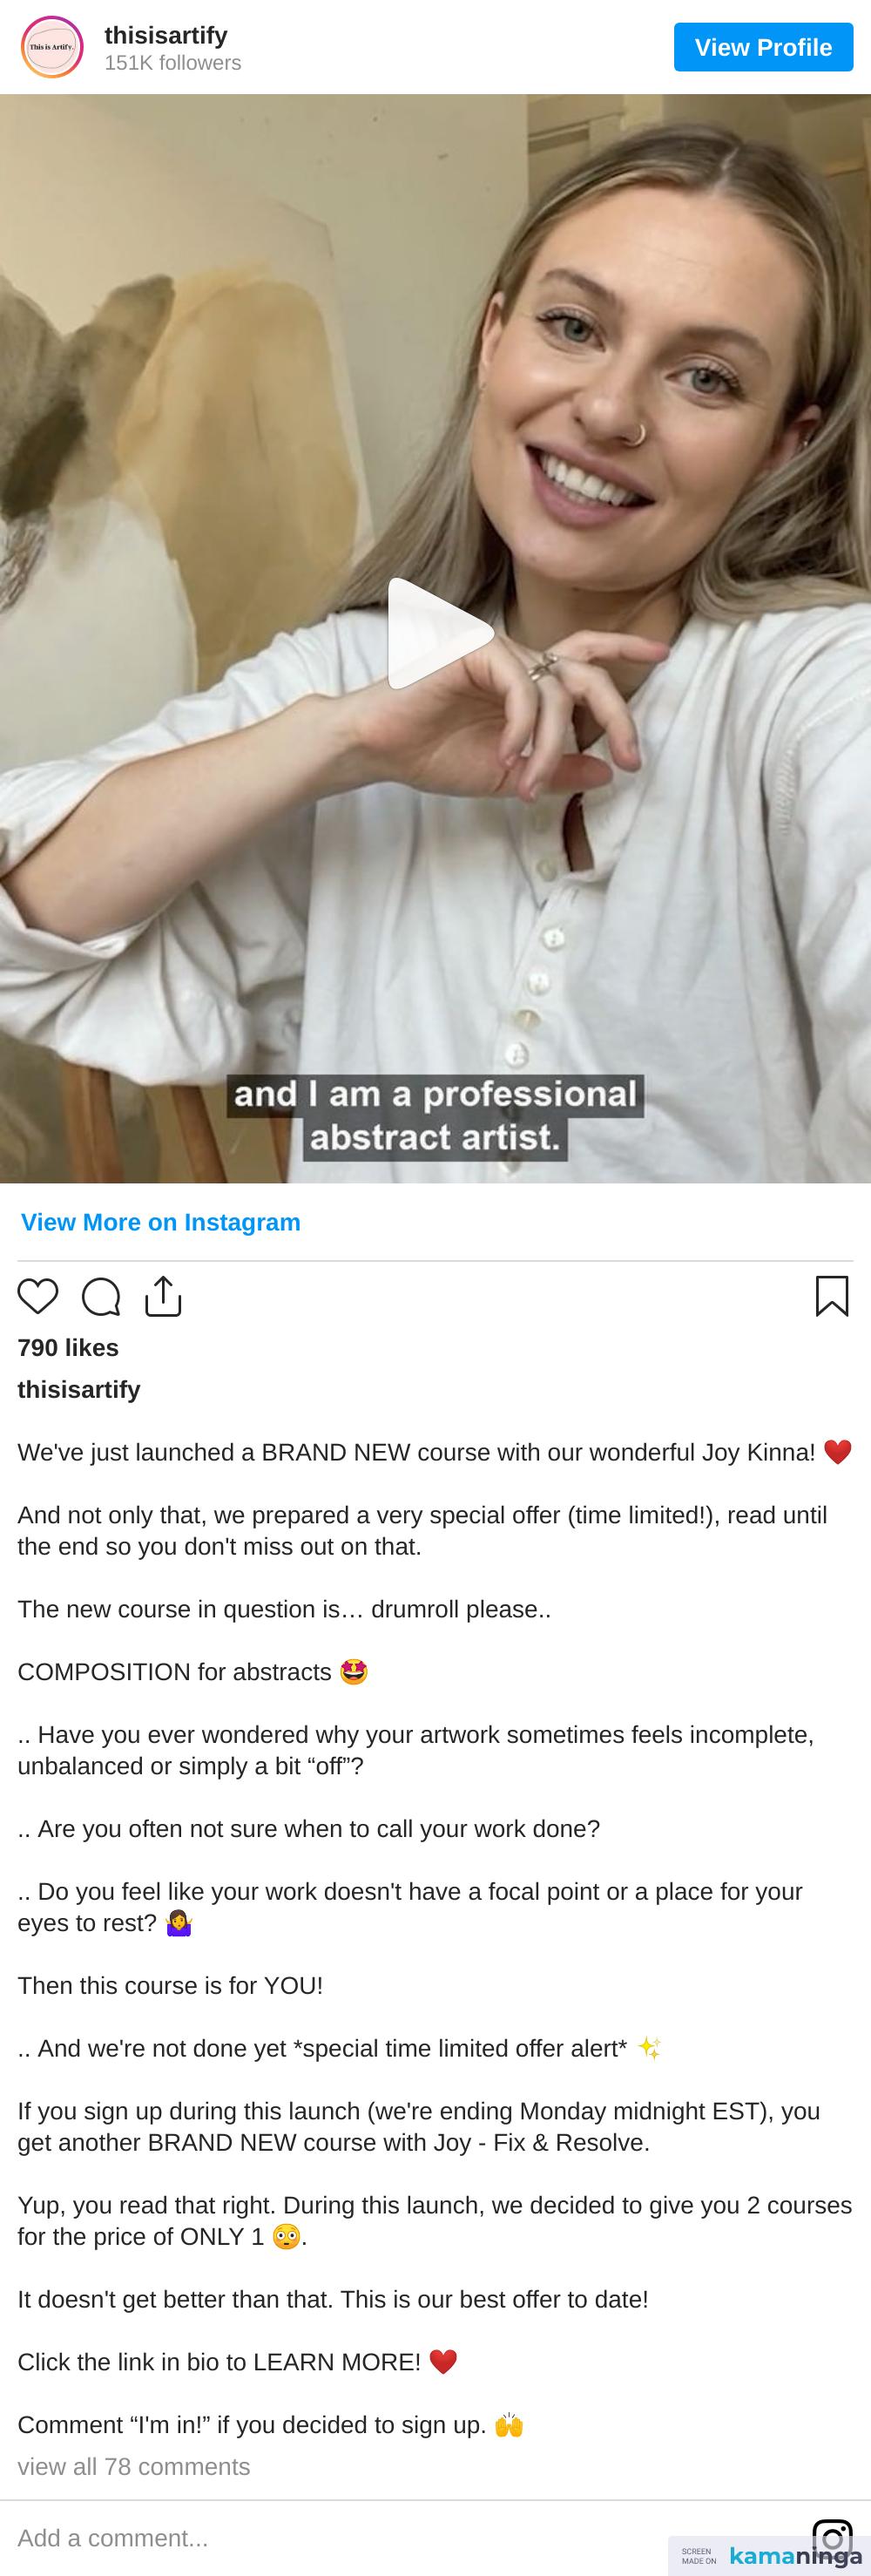 https://www.instagram.com/p/CRH5s0KDfHc/